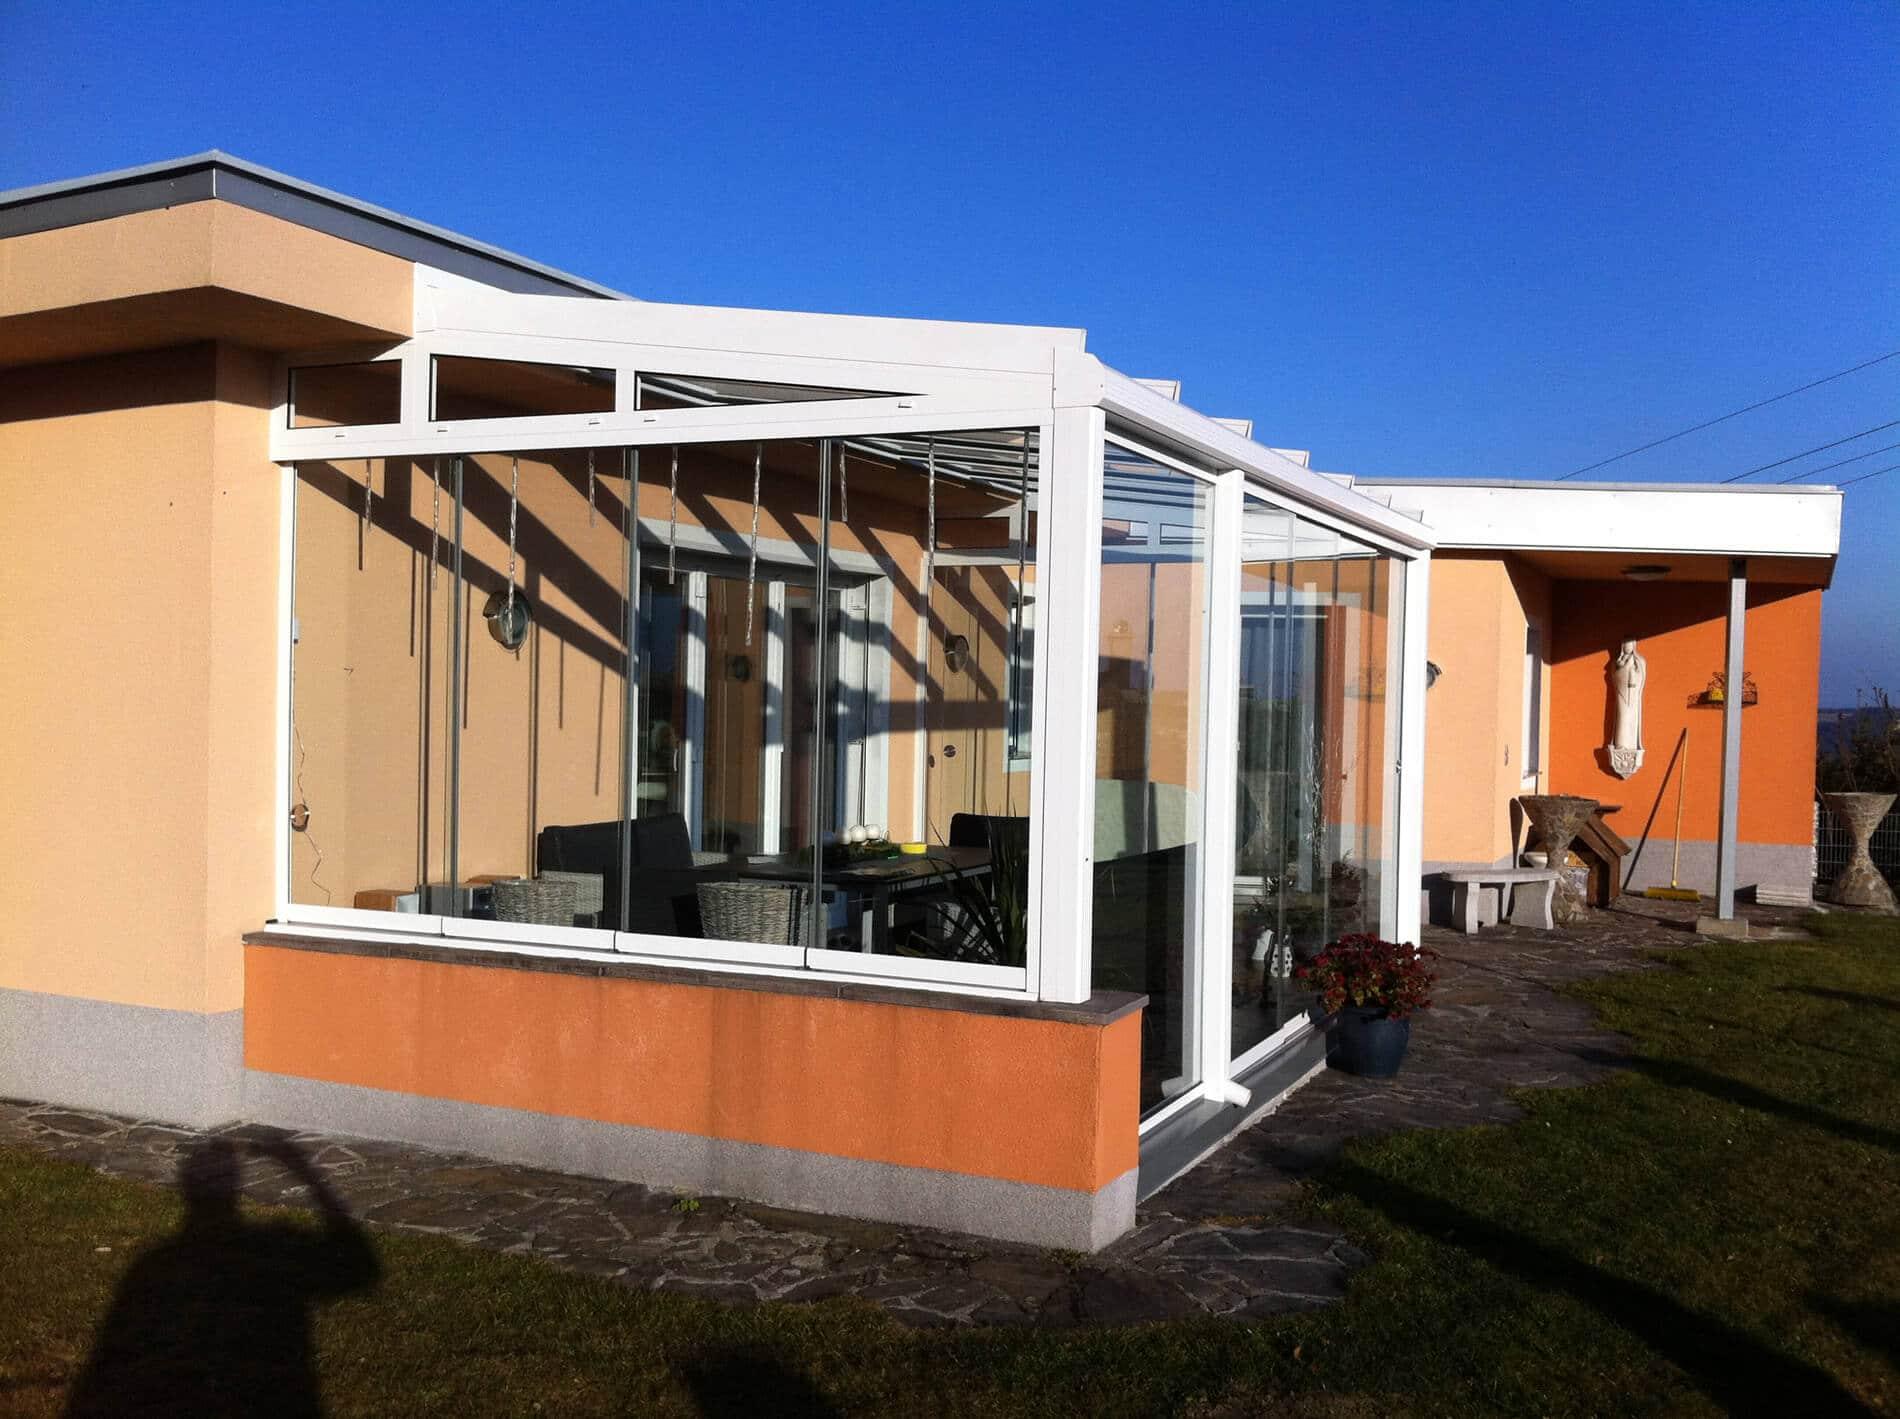 Sommergärten mit rahmenloser Optik